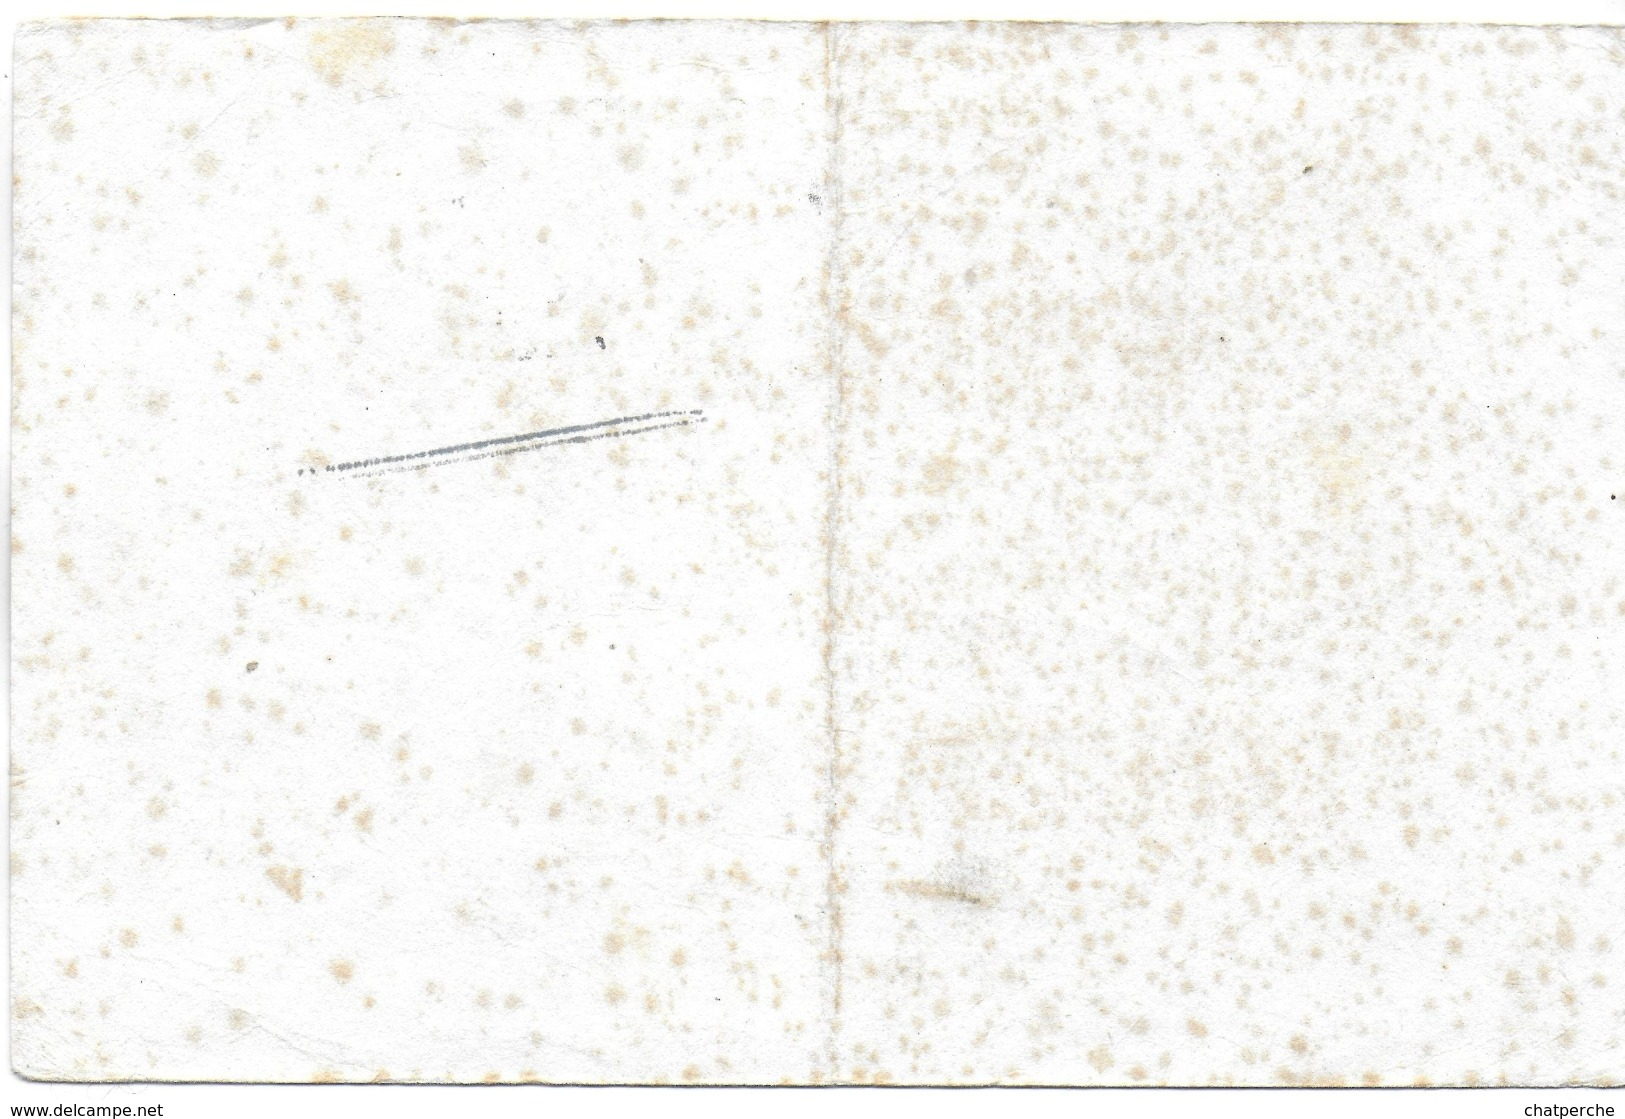 BUVARD BLOTTING PAPER PHARMACIE PENINSULFA ORL PUTEAUX 75 SEINE - Produits Pharmaceutiques